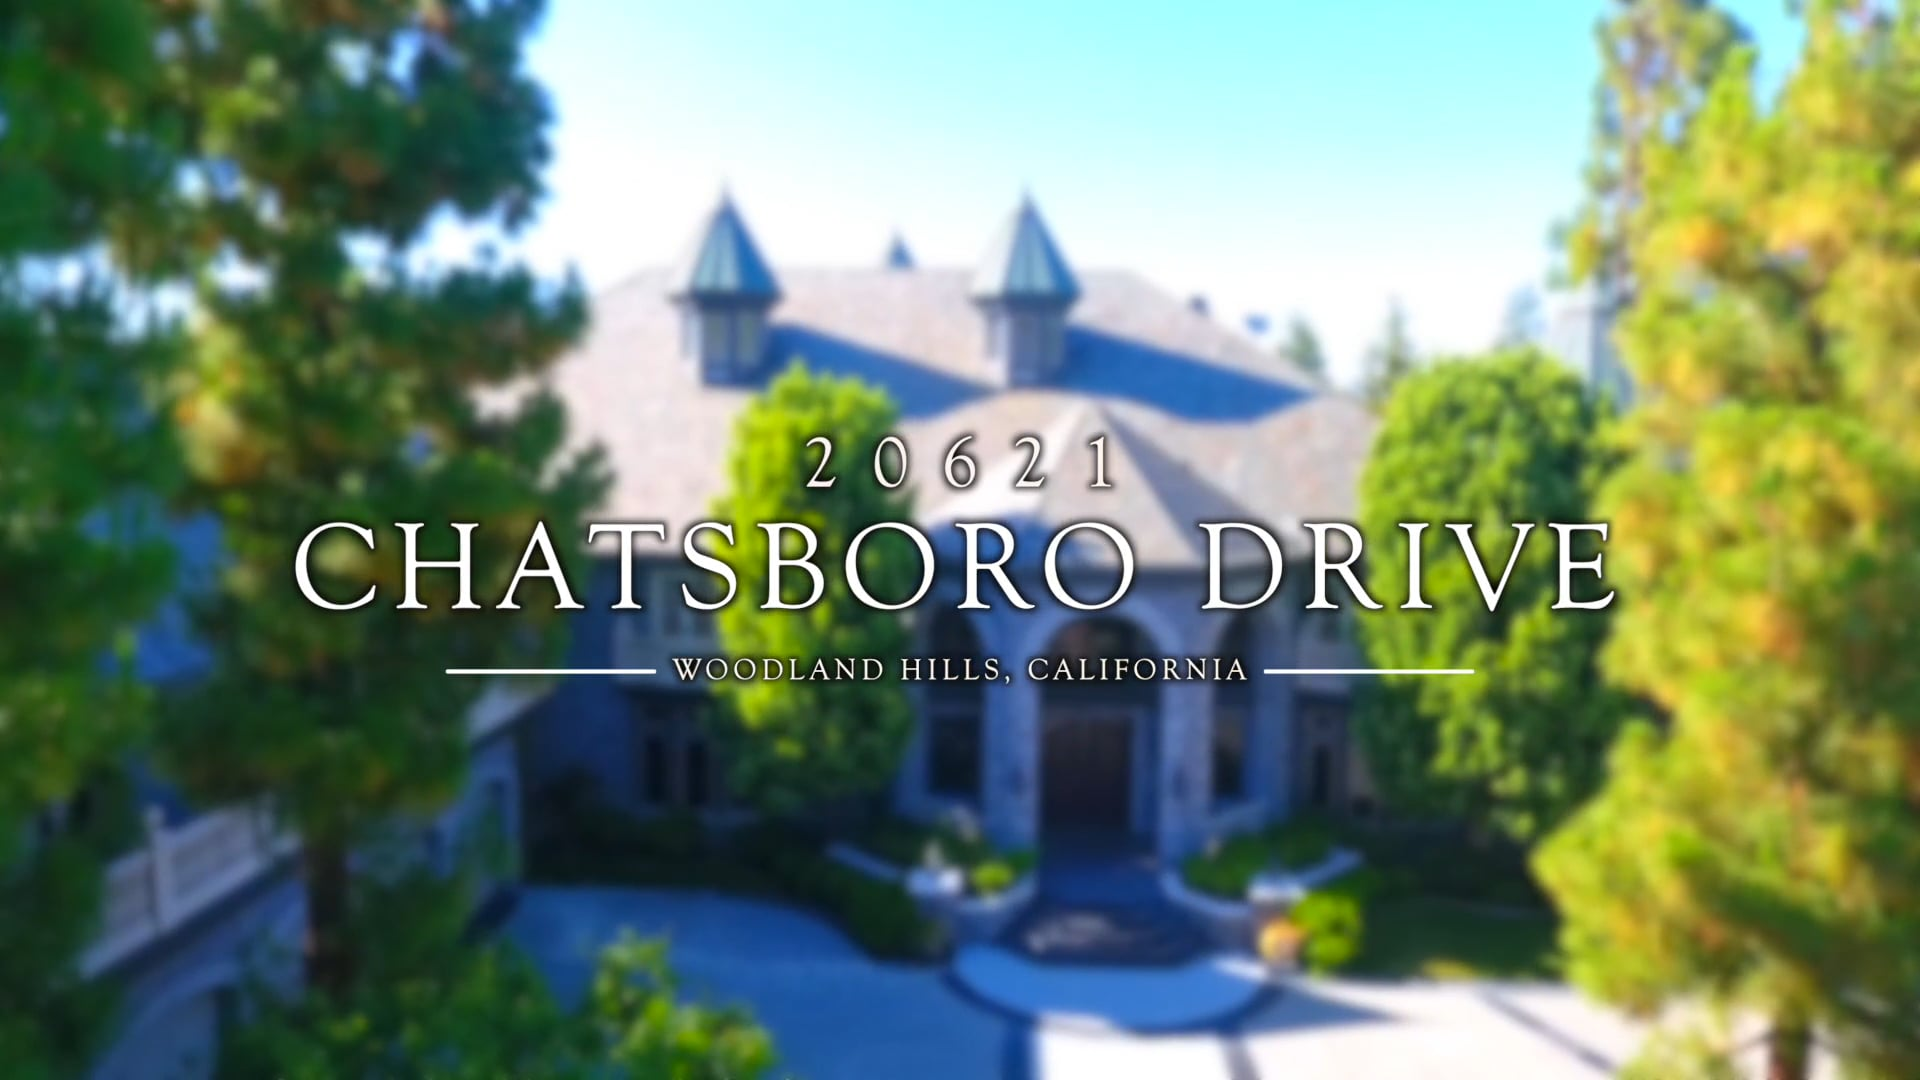 20621 CHATSBORO DR_, WOODLAND HILLS, CA